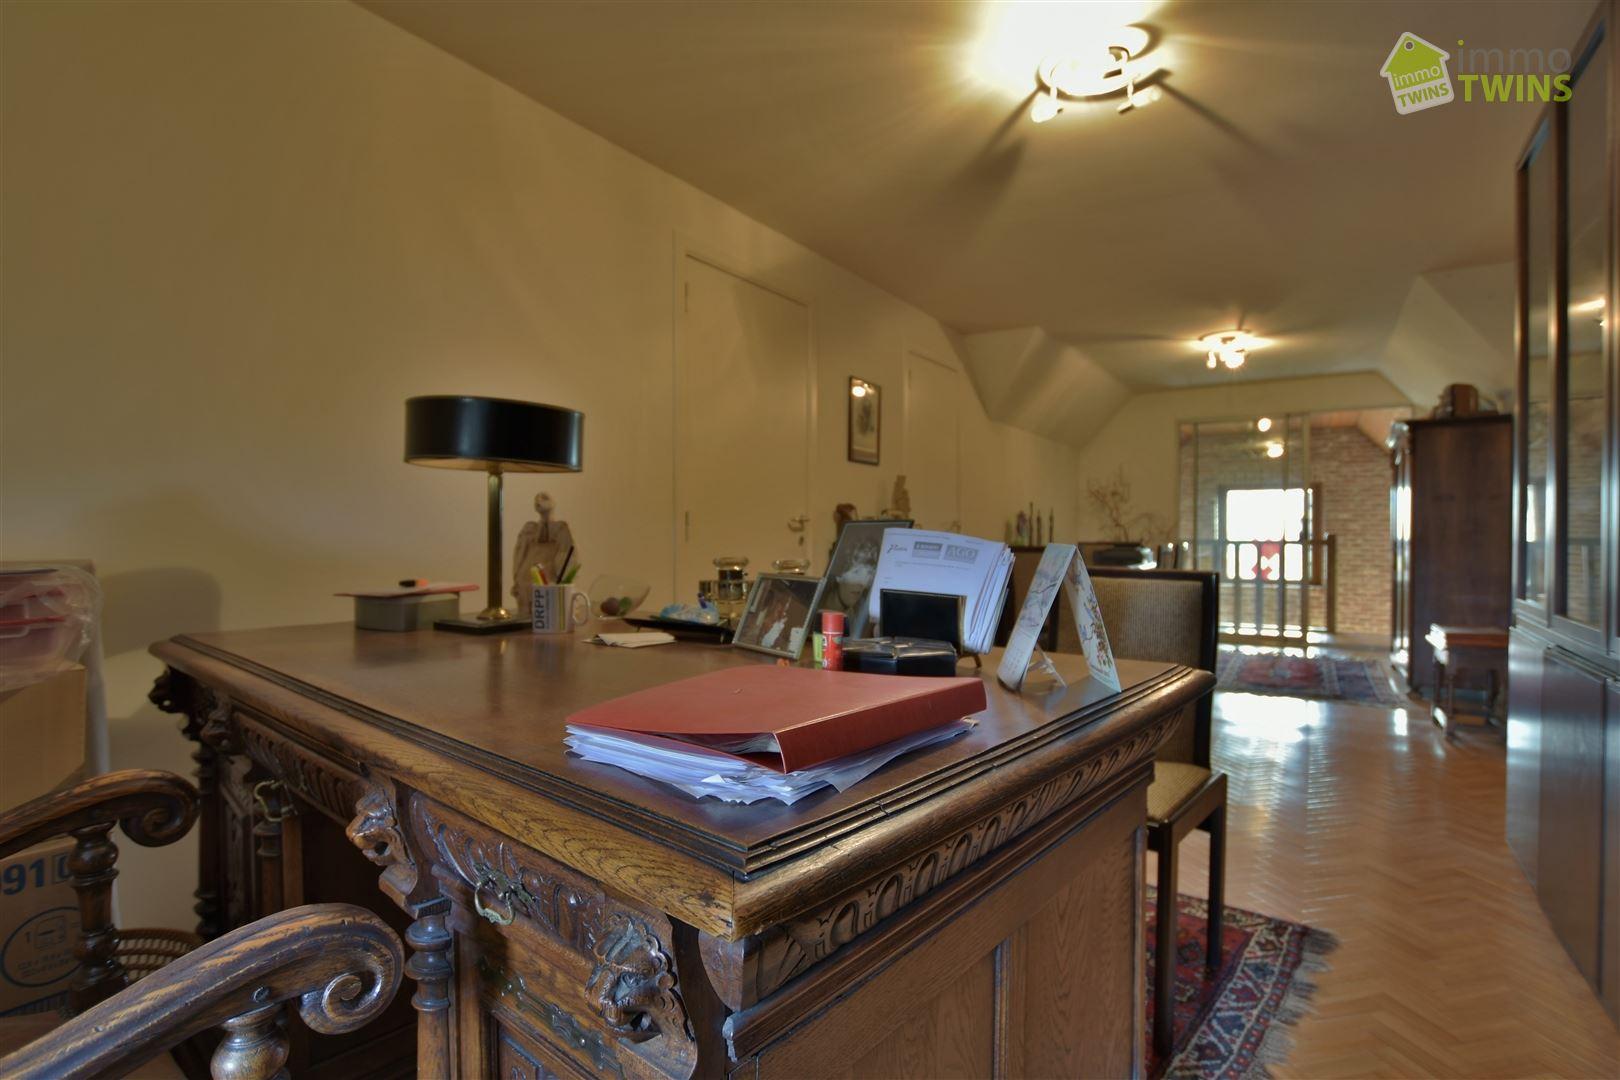 Foto 24 : Duplex/triplex te 9200 Dendermonde (België) - Prijs € 398.000